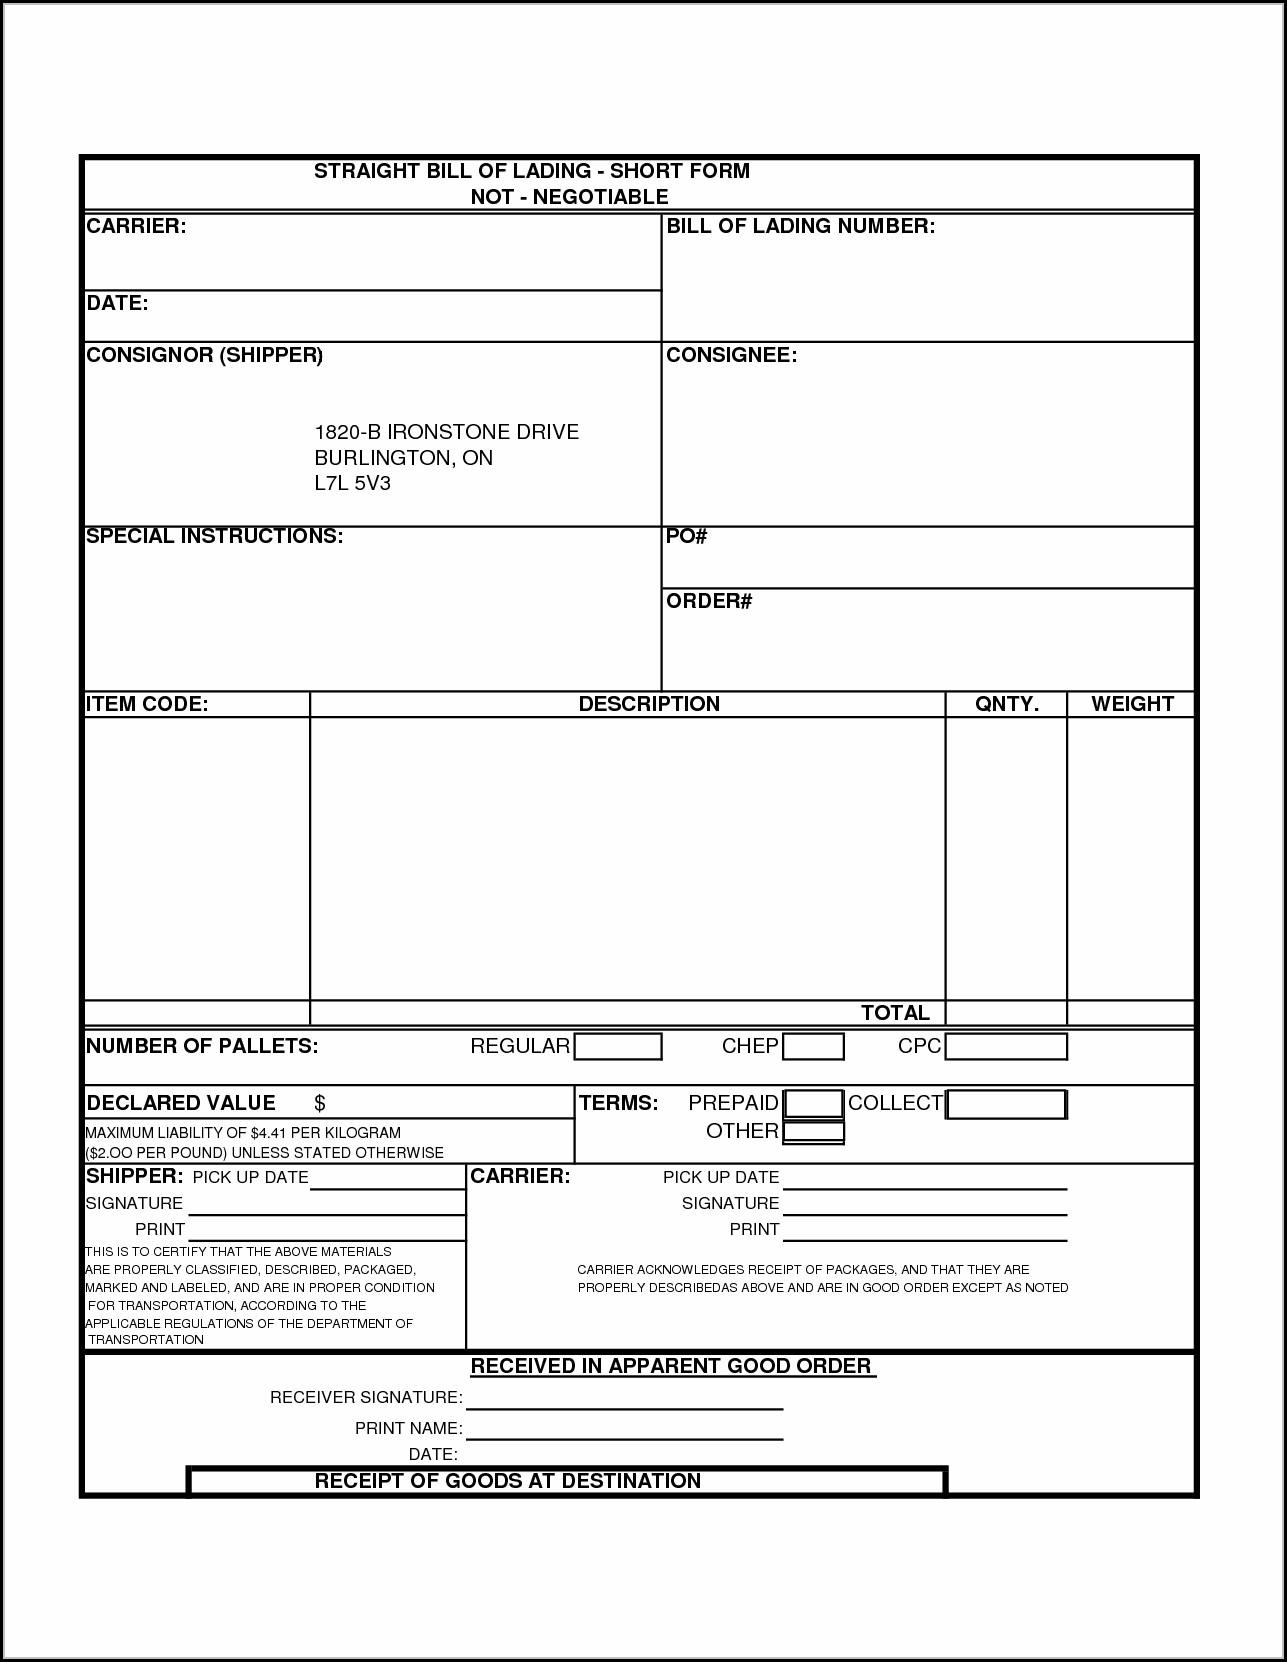 Free Printable Straight Bill Of Lading Short Form